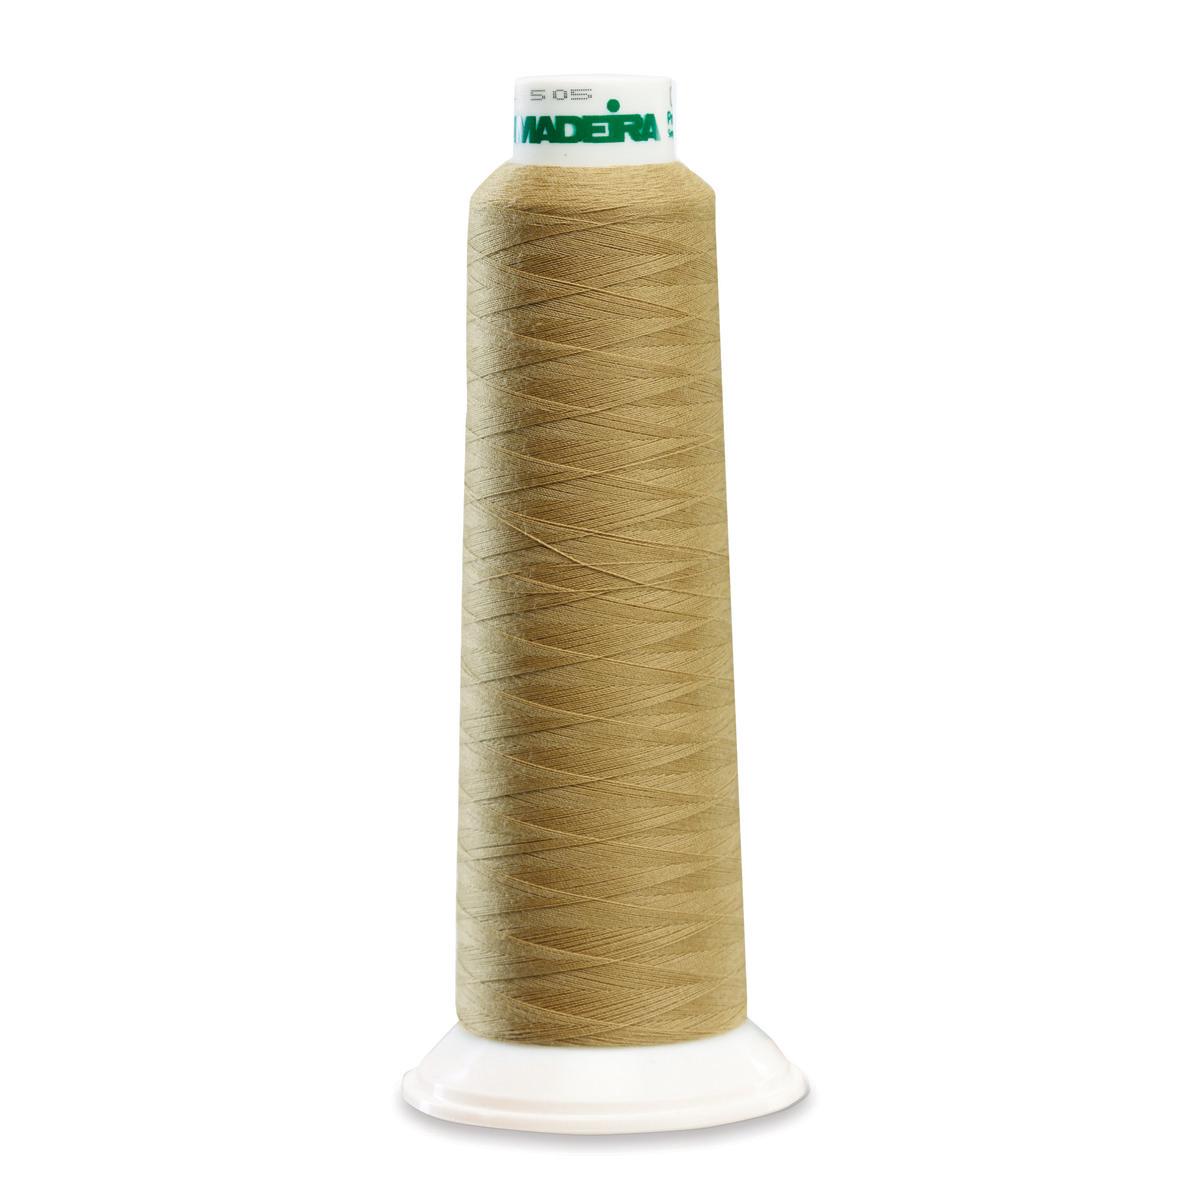 9939 Khaki Poly Serger Thread Madeira Aerolock